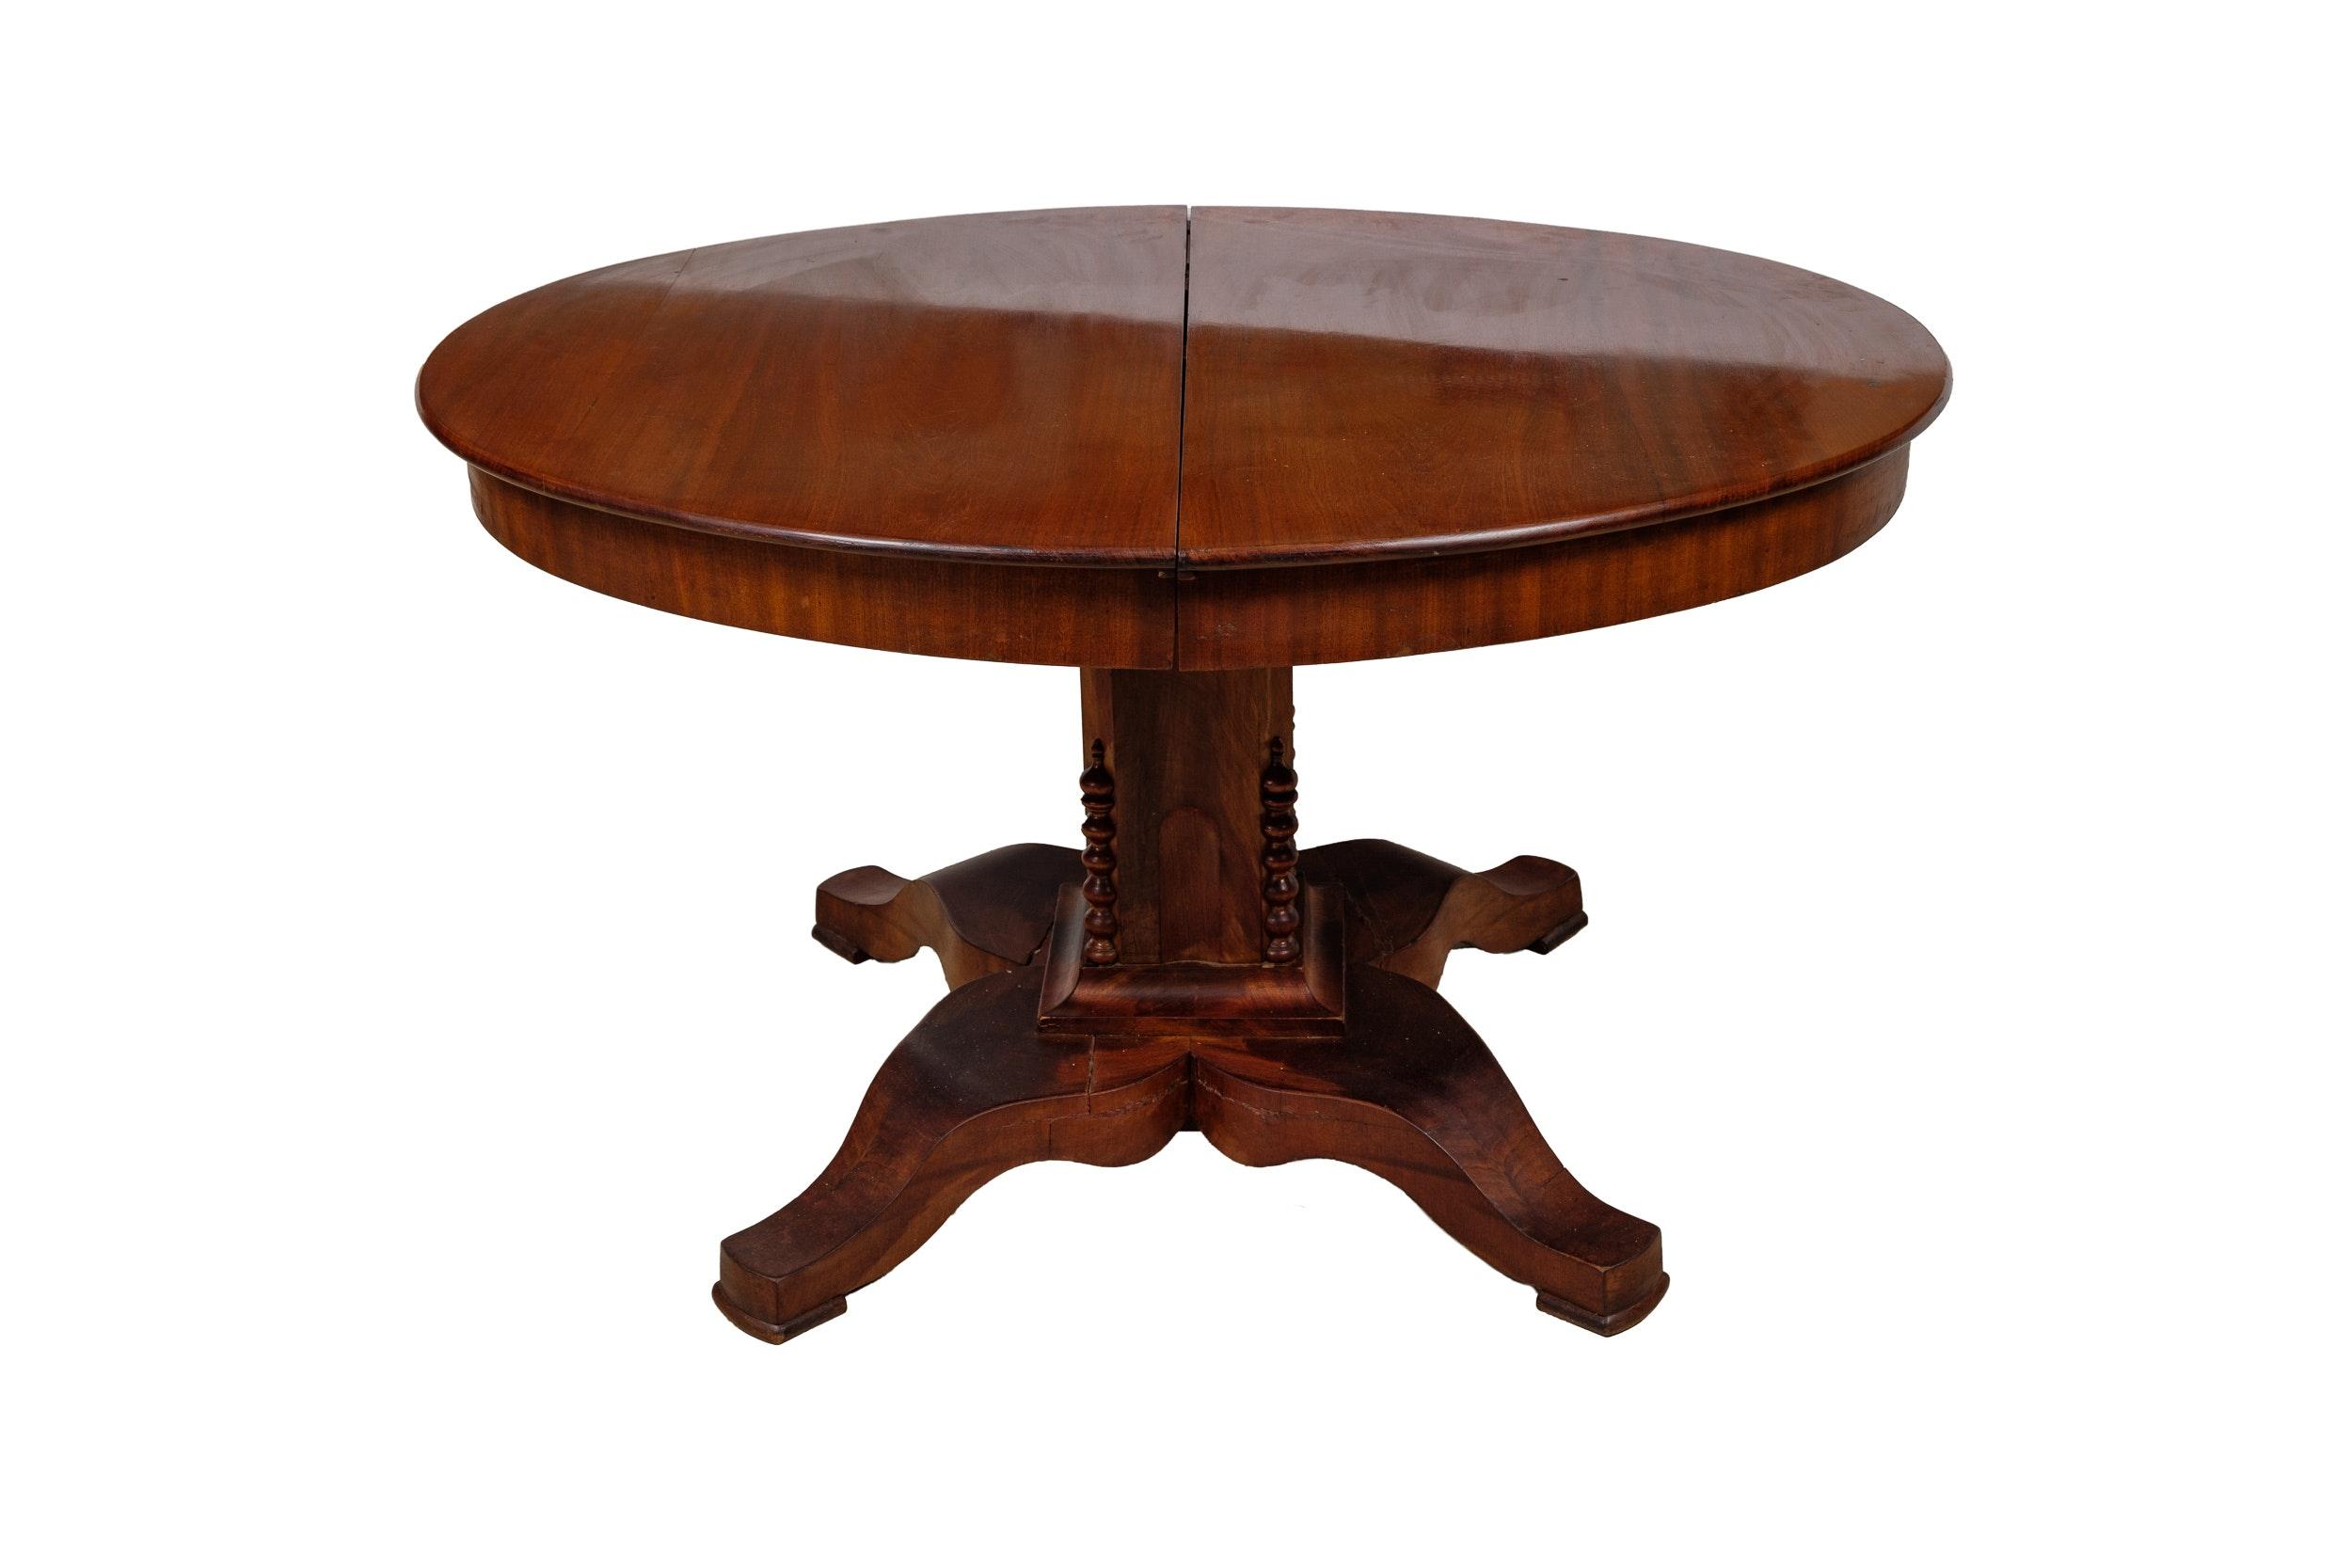 Antique Swedish Mahogany Dining Table, Circa 1850